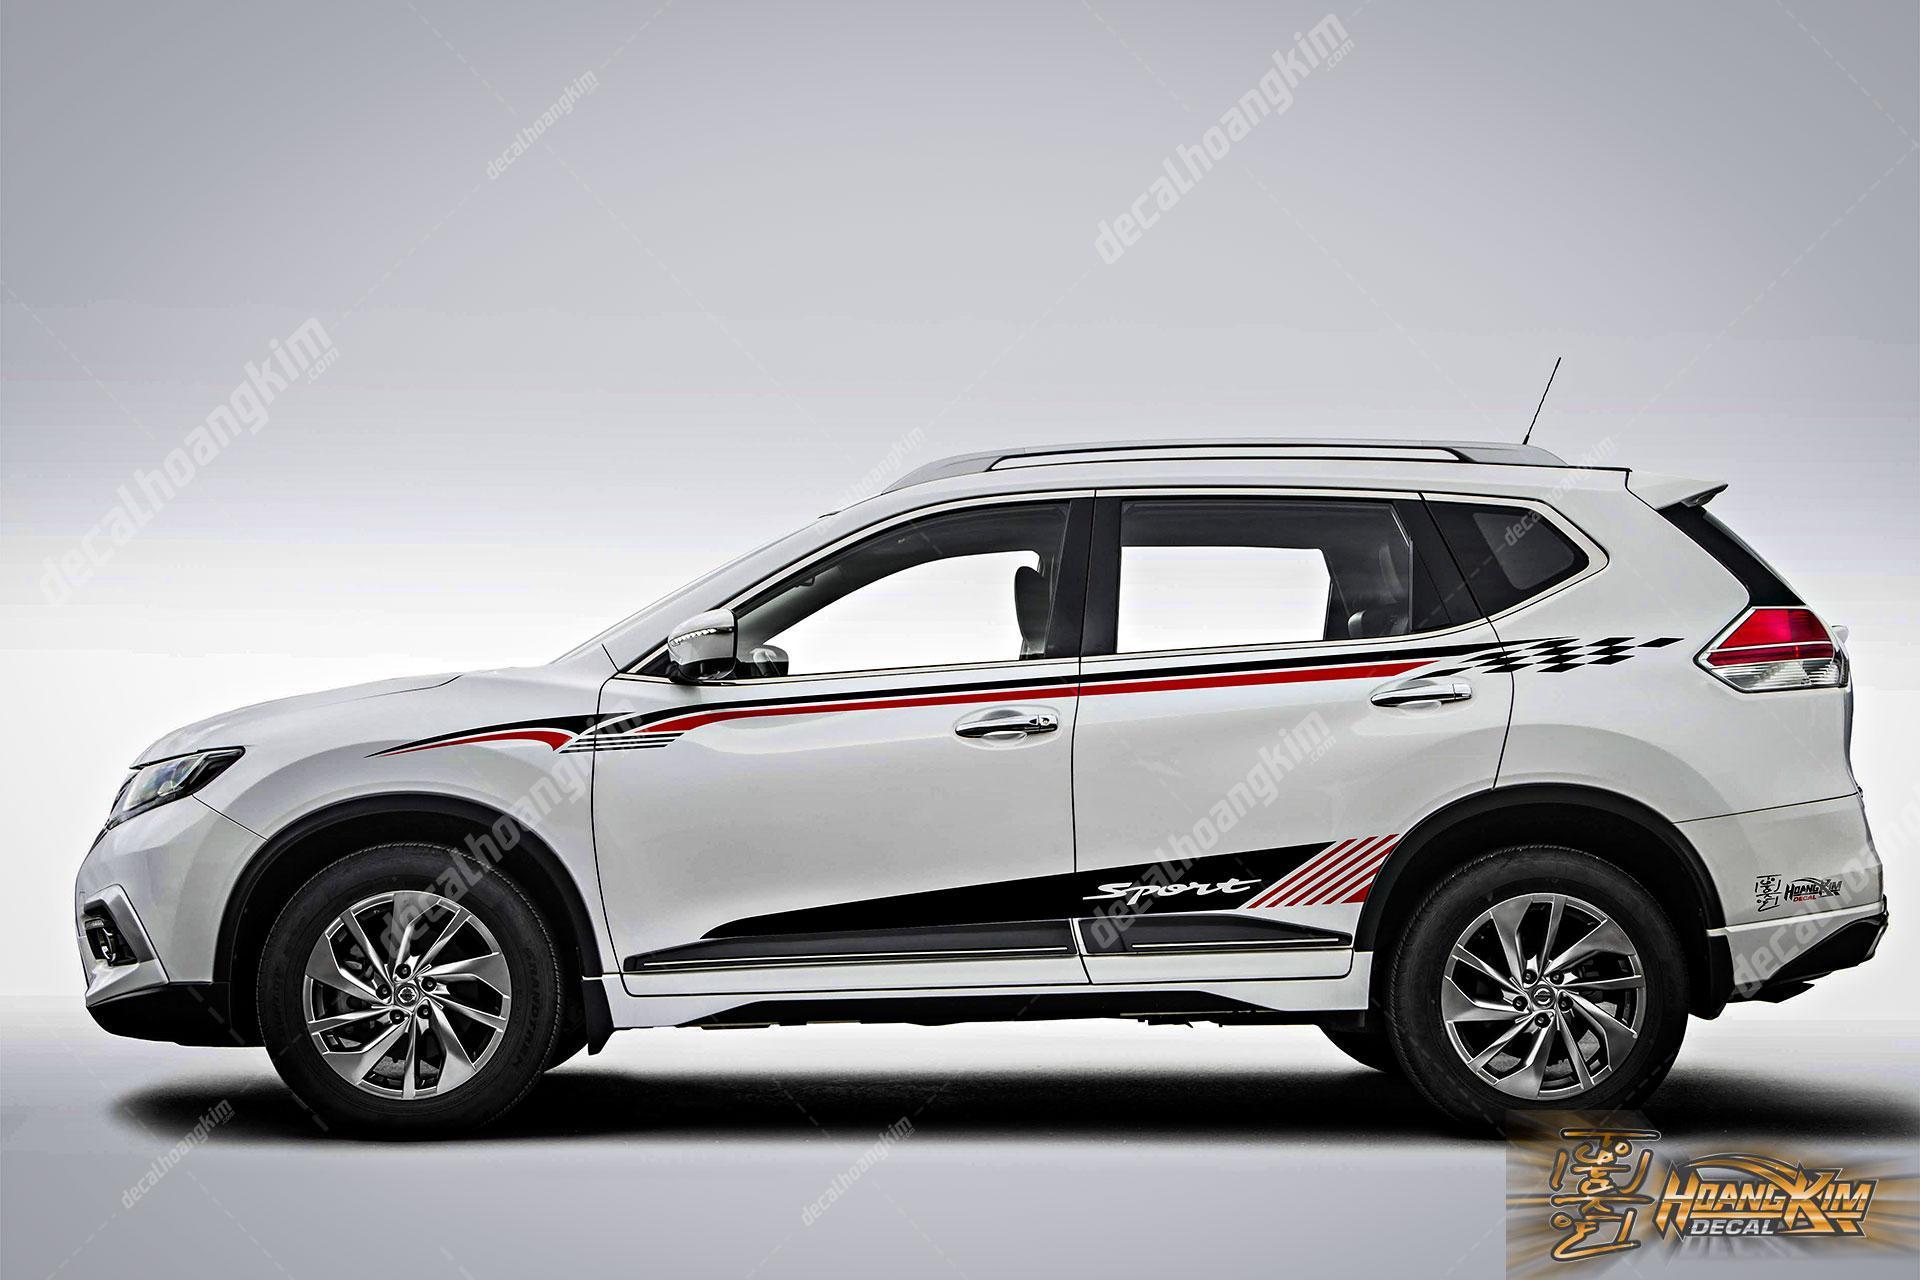 https://hoangkims5.blob.core.windows.net/otohoangkimzag152hg18/Tem-xe-Nissan-X-Trail-NXT007.jpg